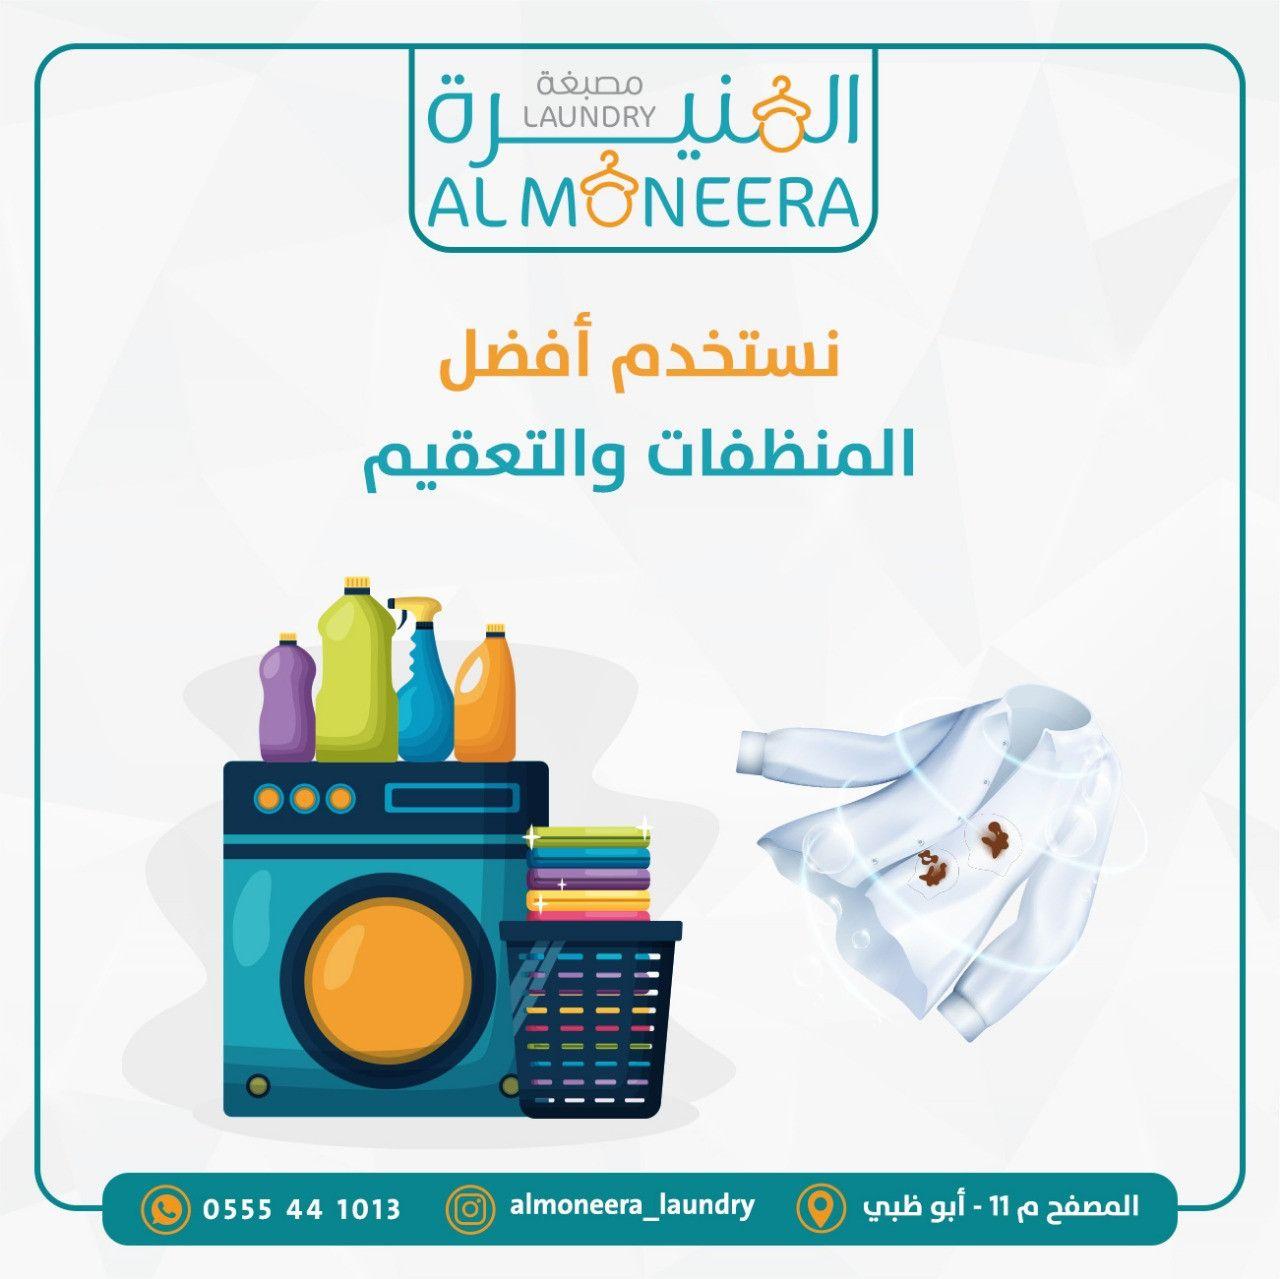 Almoneera Laundry 3